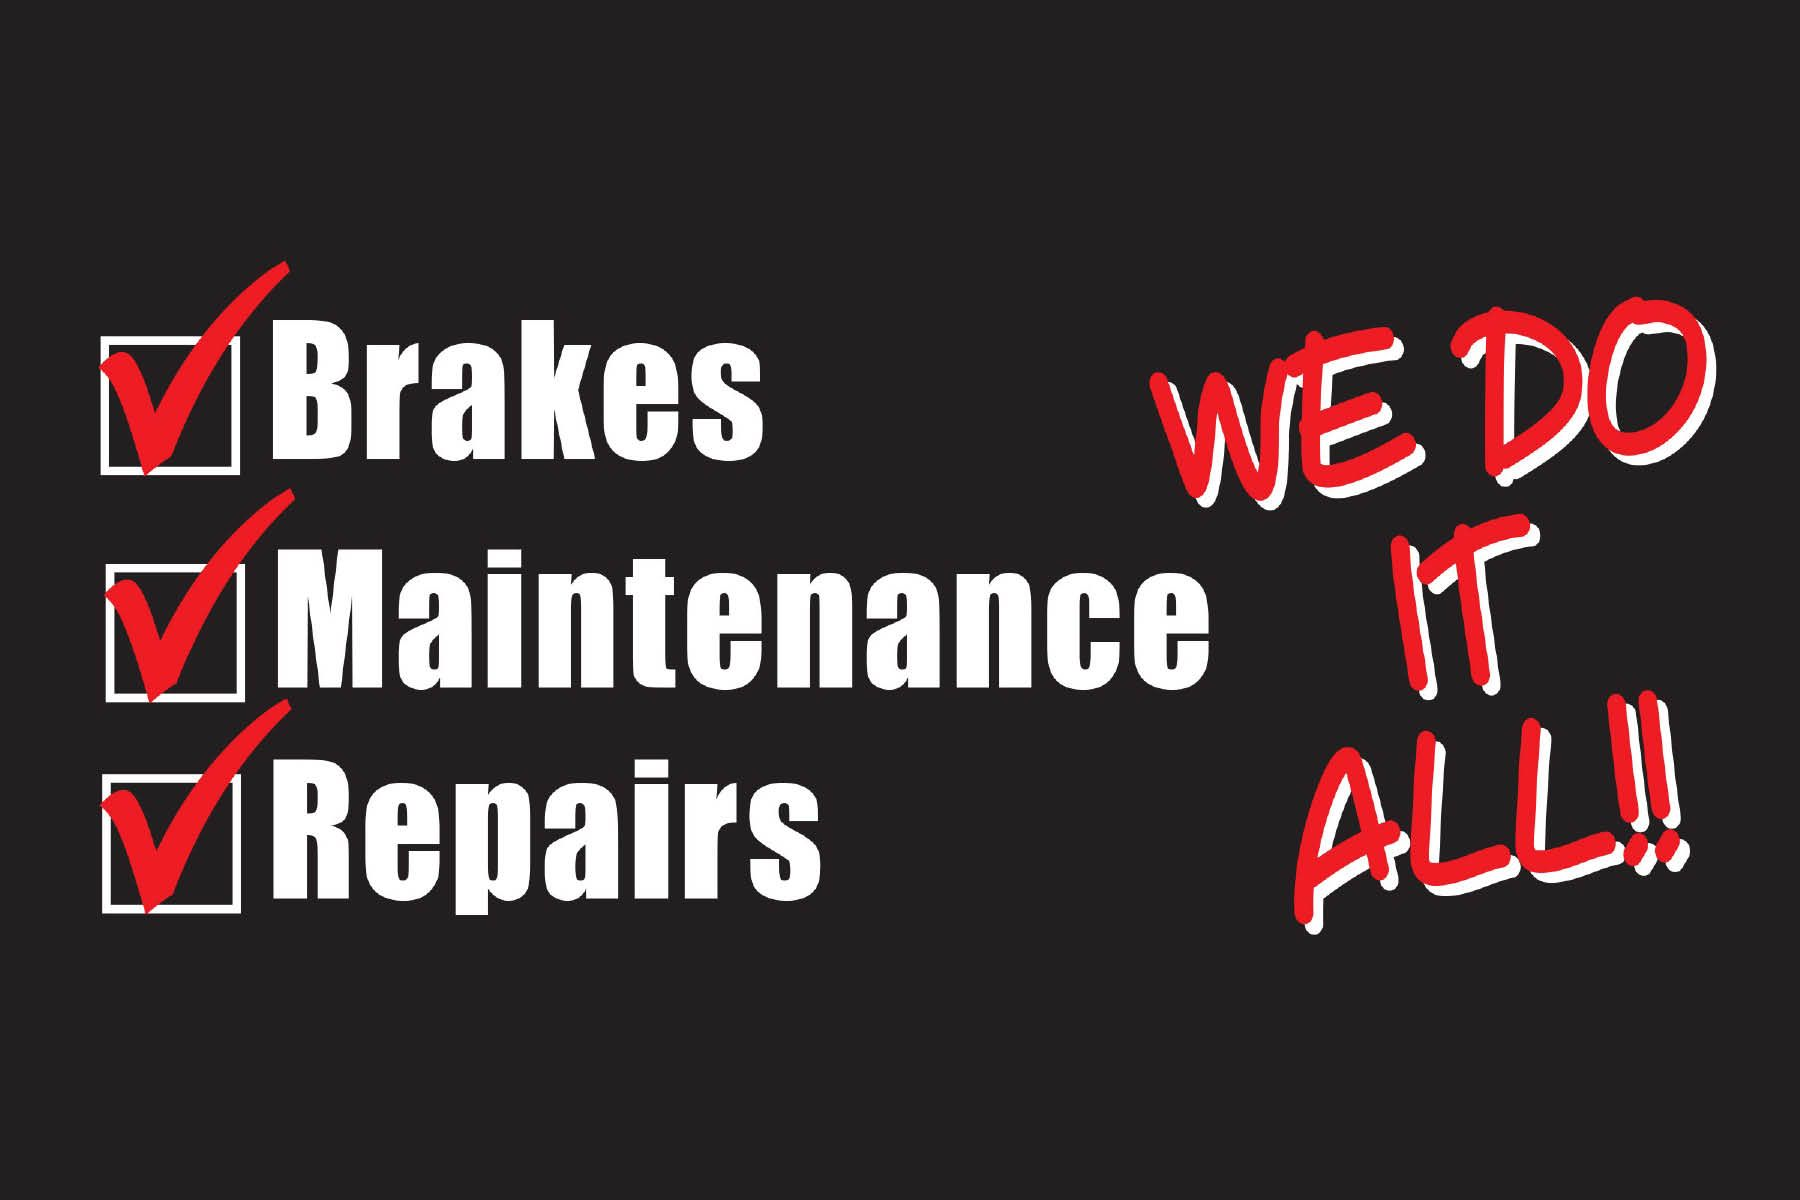 Auto Repair Shop Slogans Brakes Plus Oil Change Auto Repair